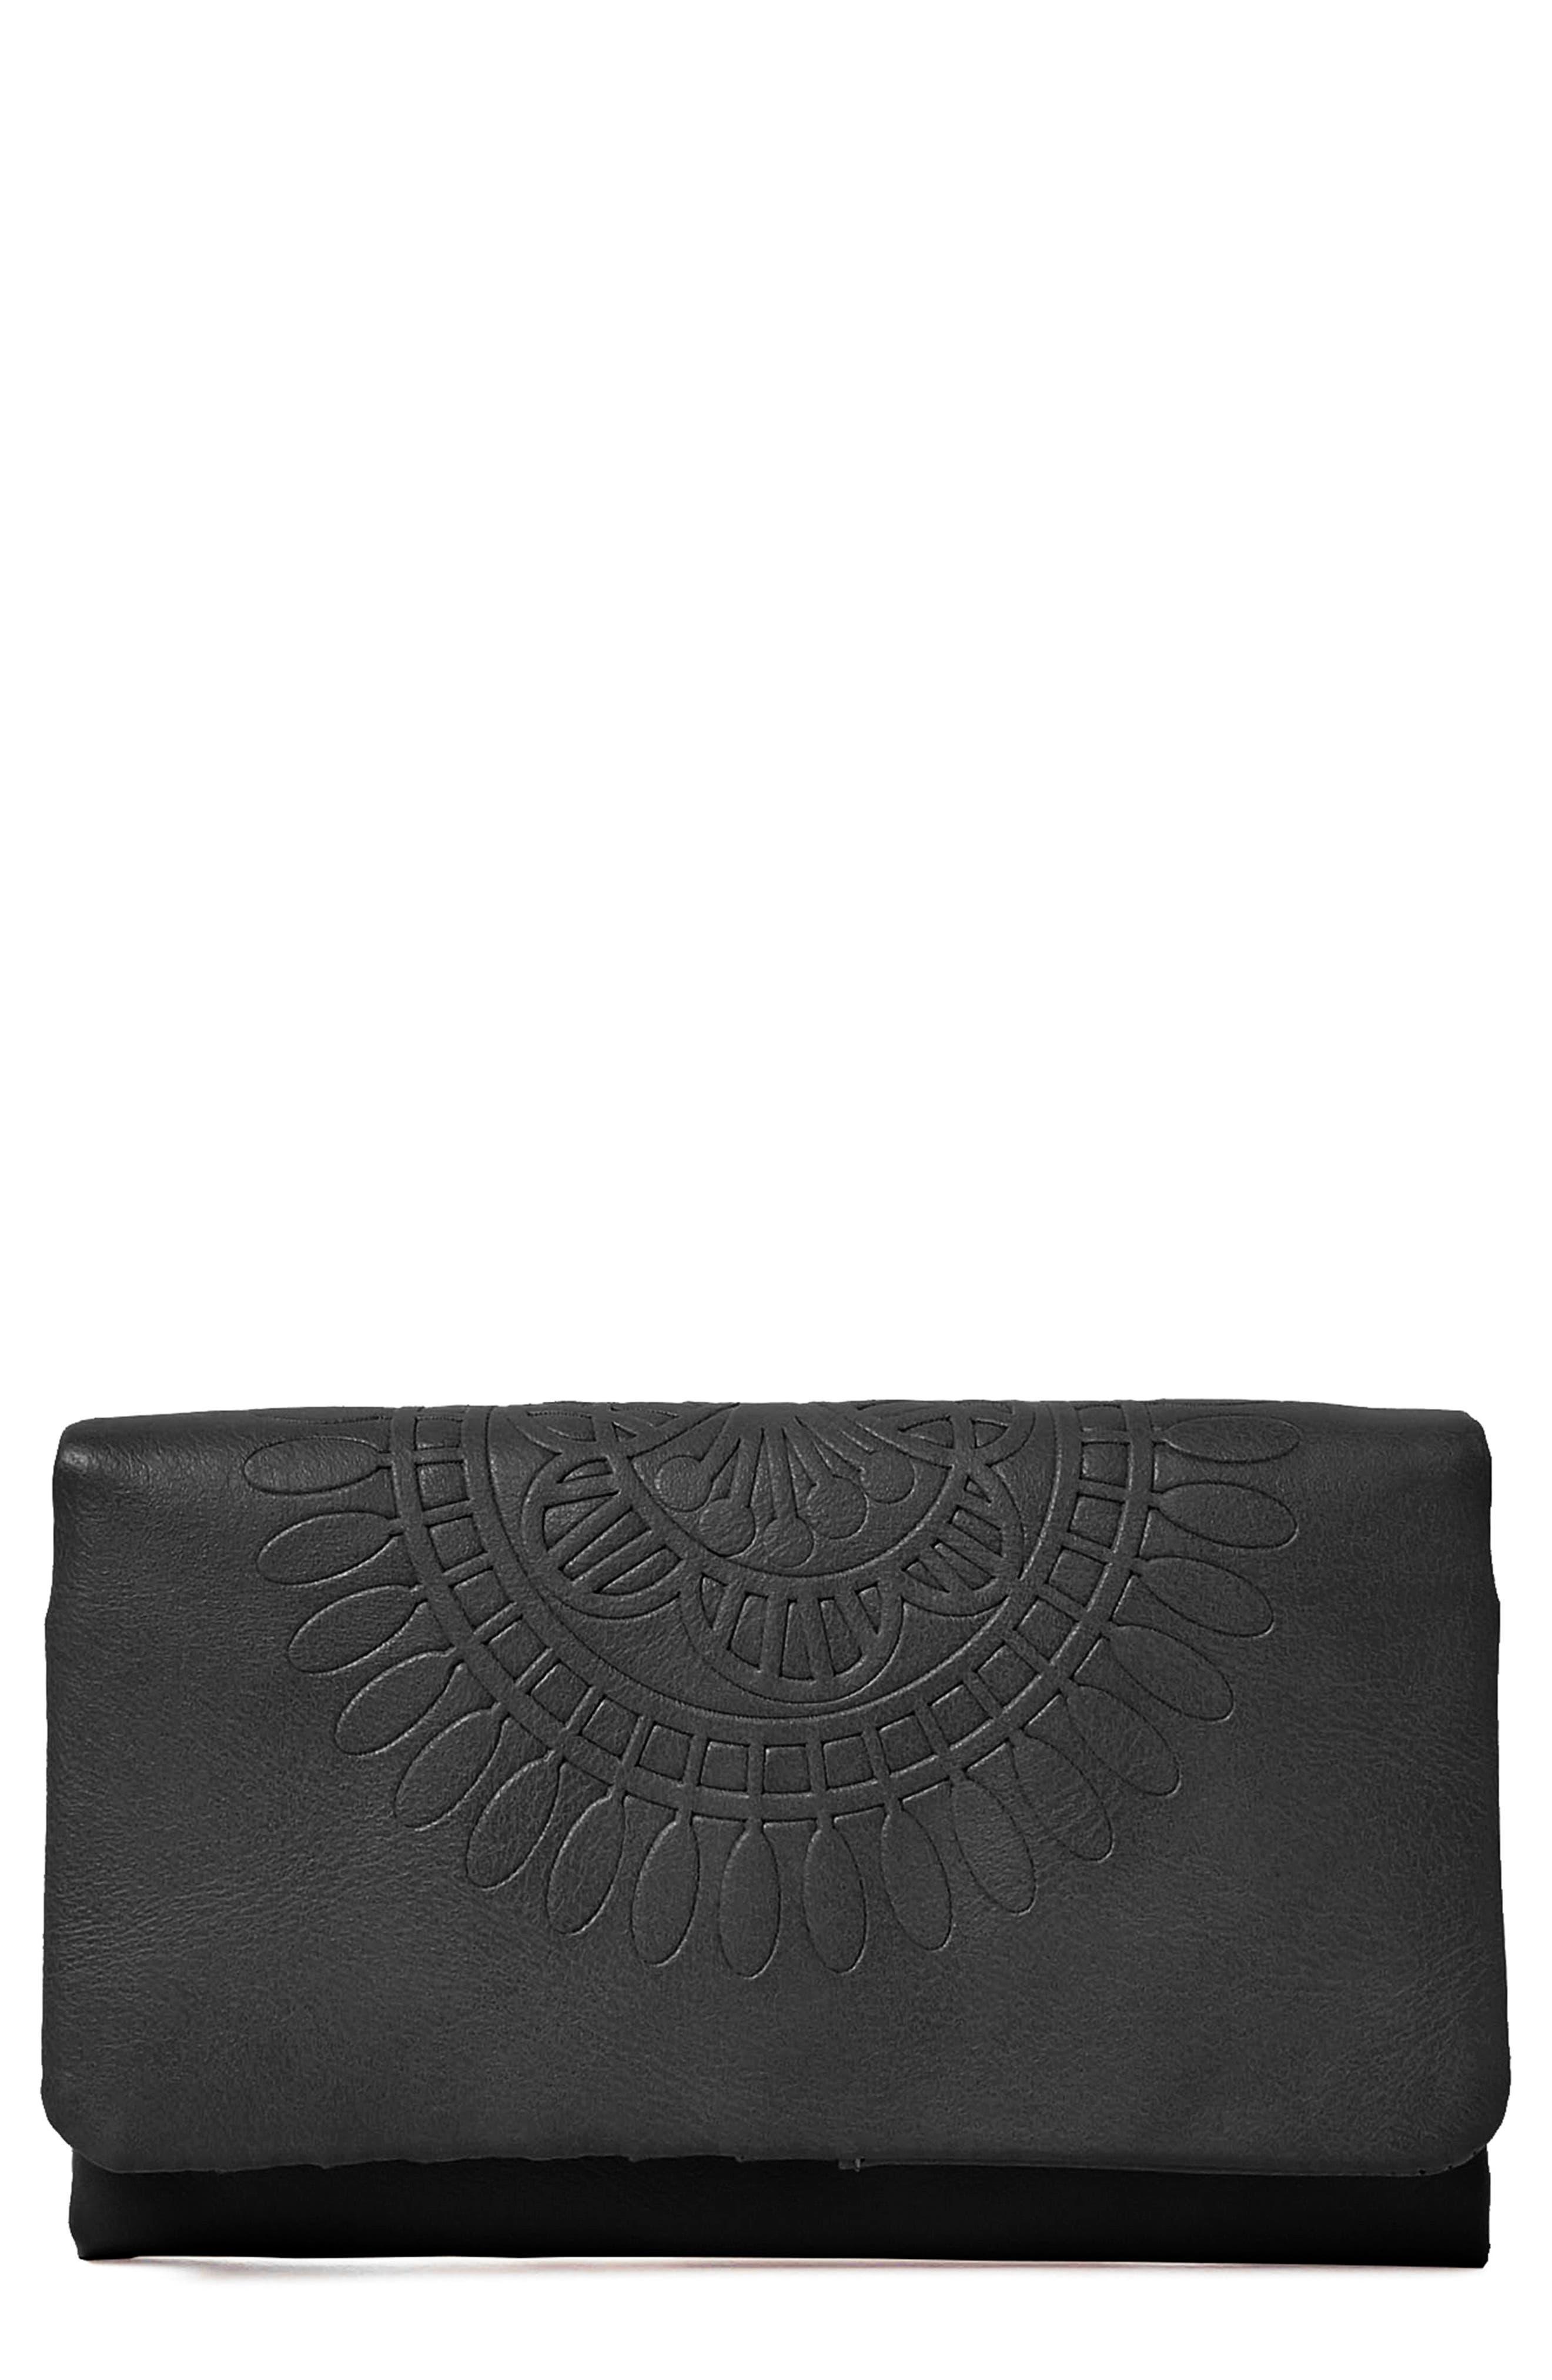 URBAN ORIGINALS Flower Gypsy Vegan Leather Wallet, Main, color, 001